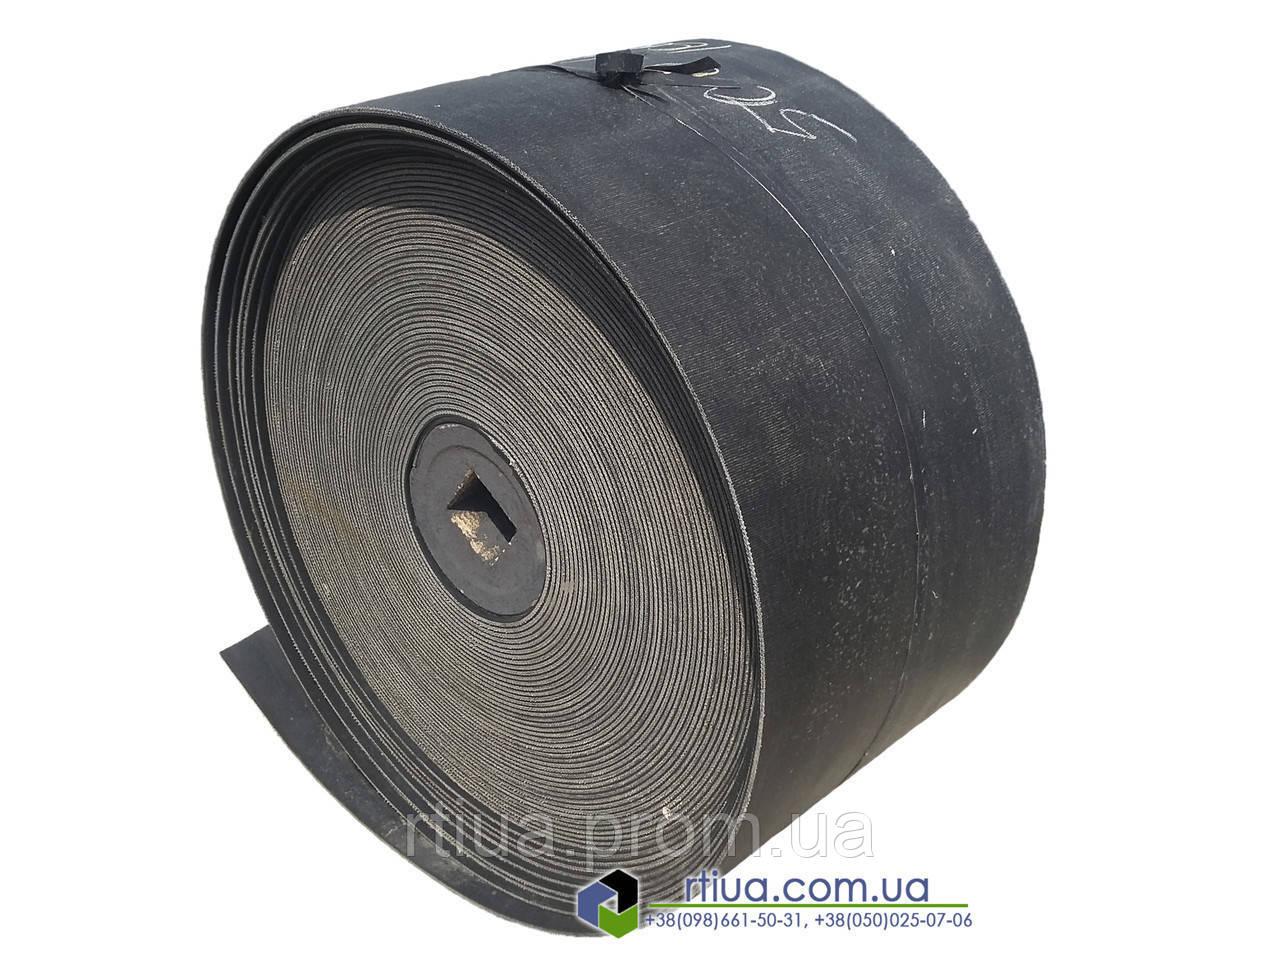 Конвейерная лента 175х8 мм